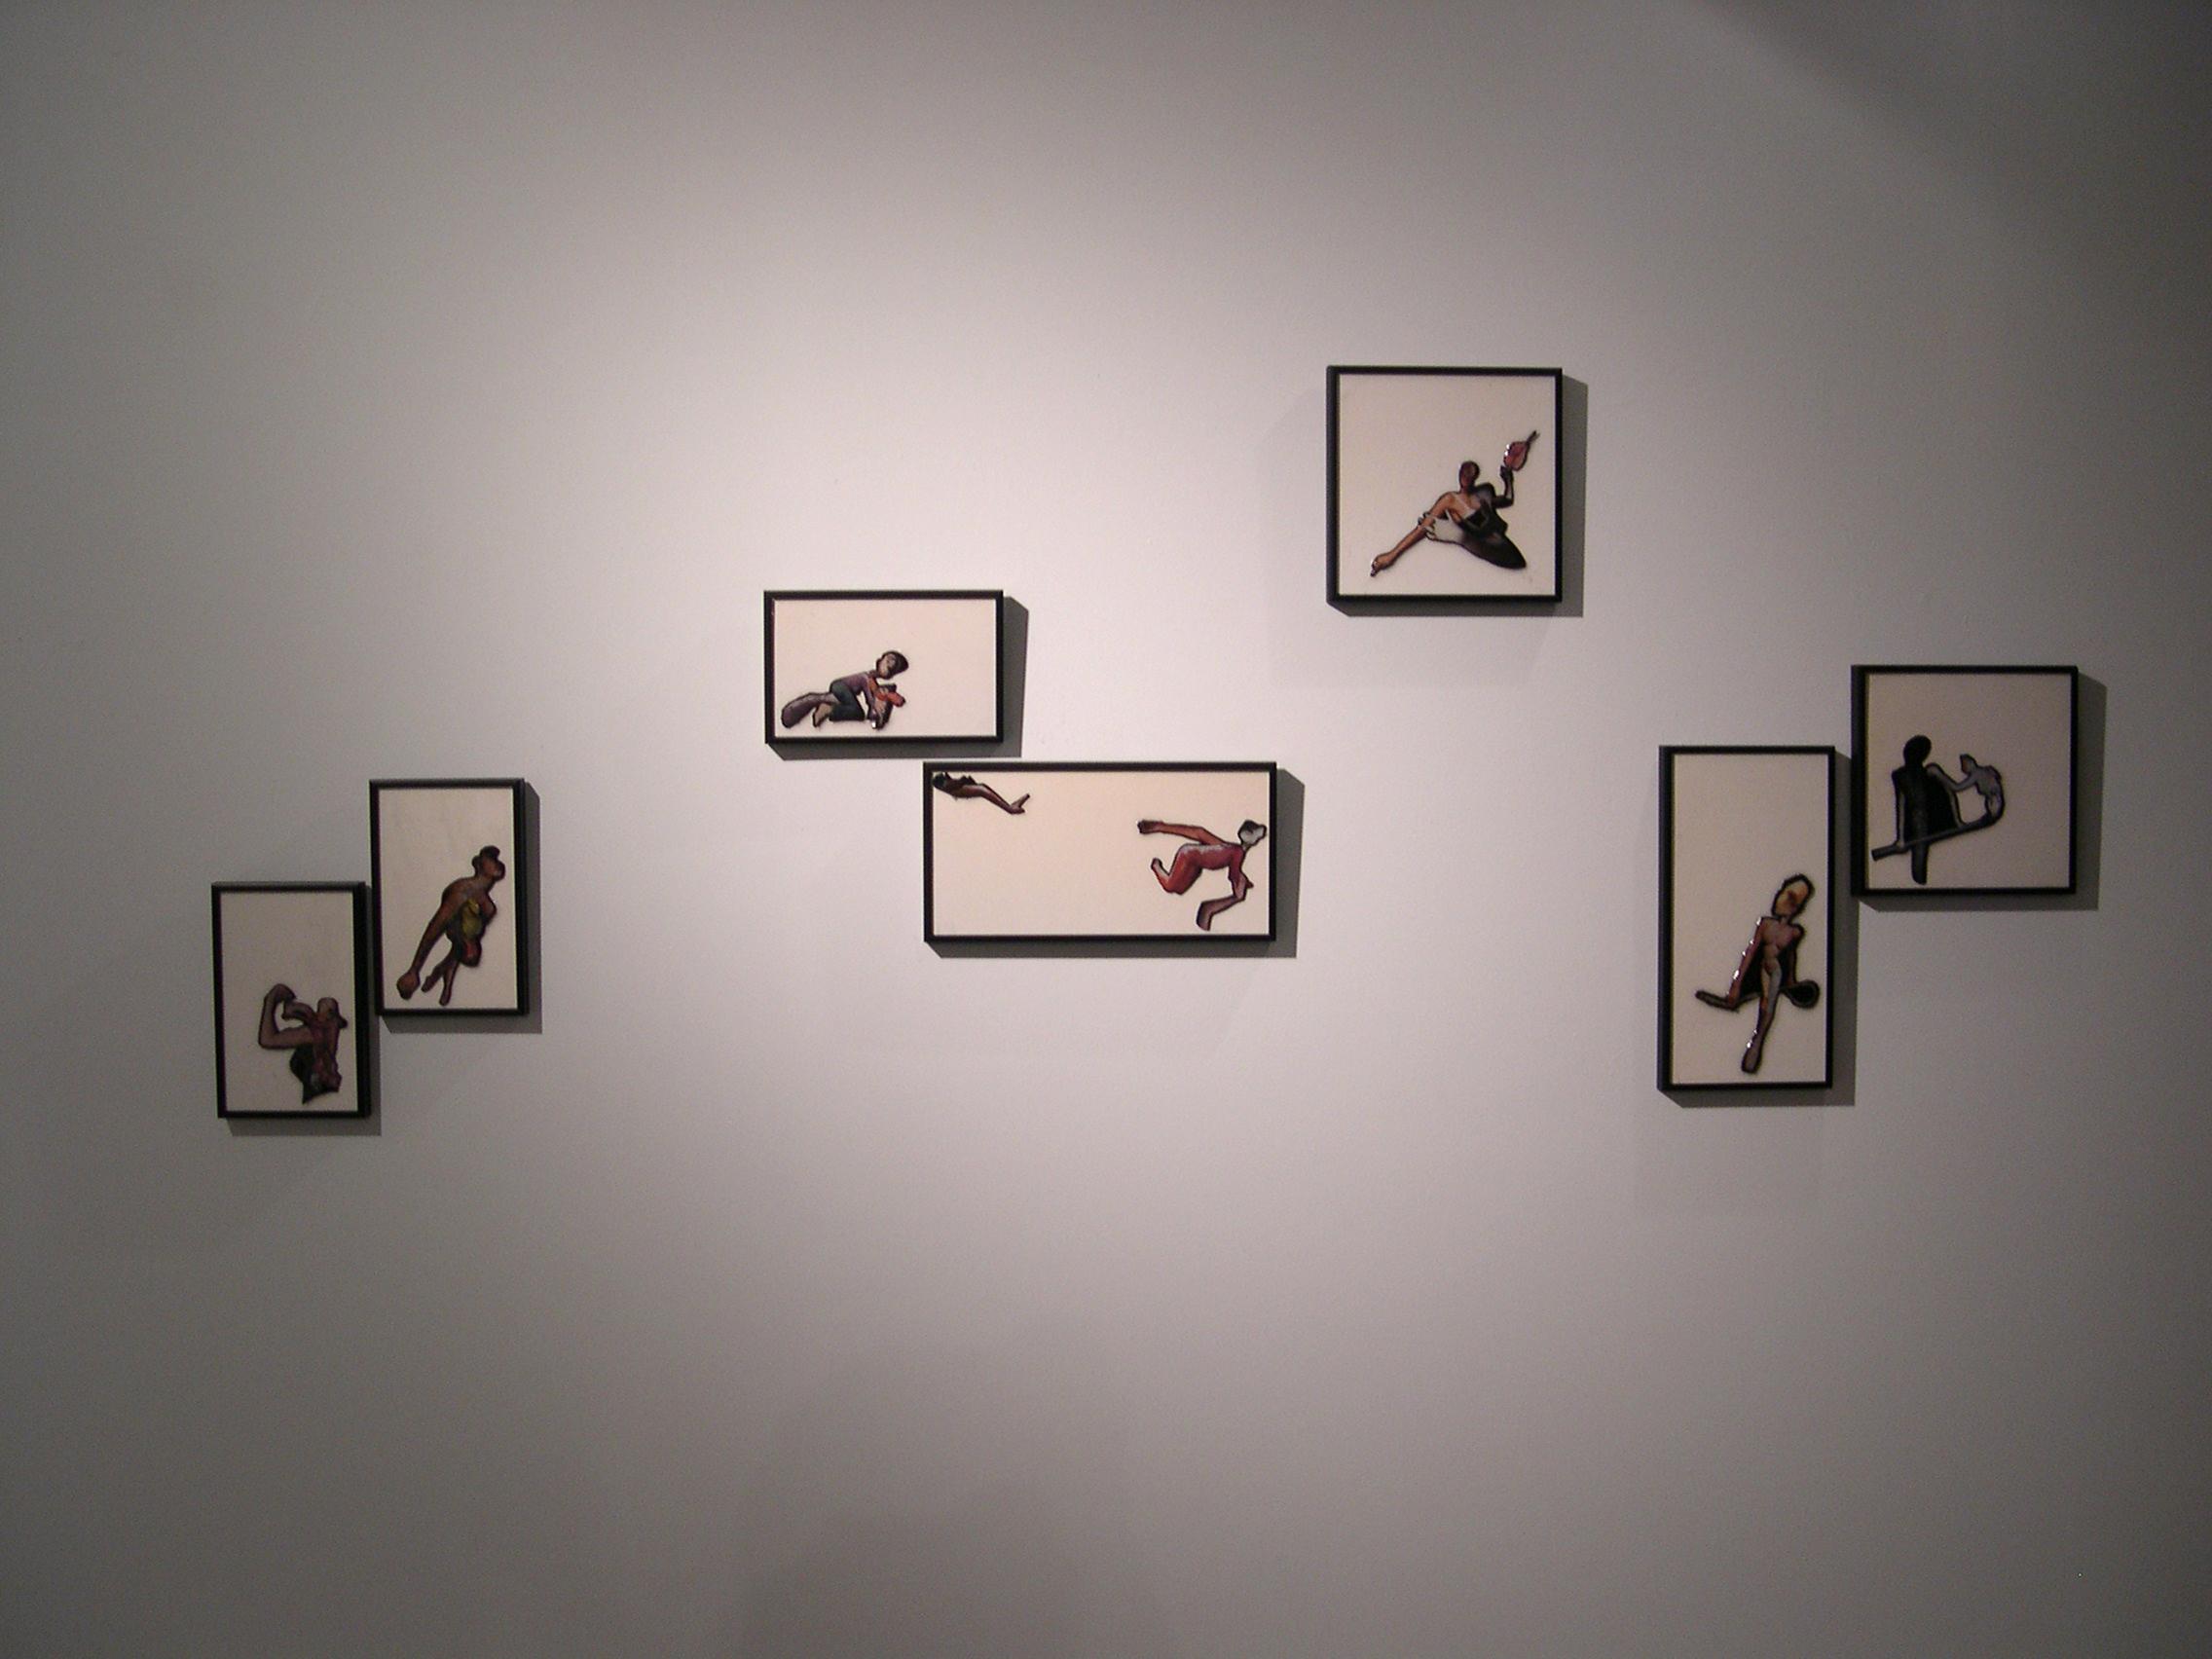 Installation View - Black Sereis